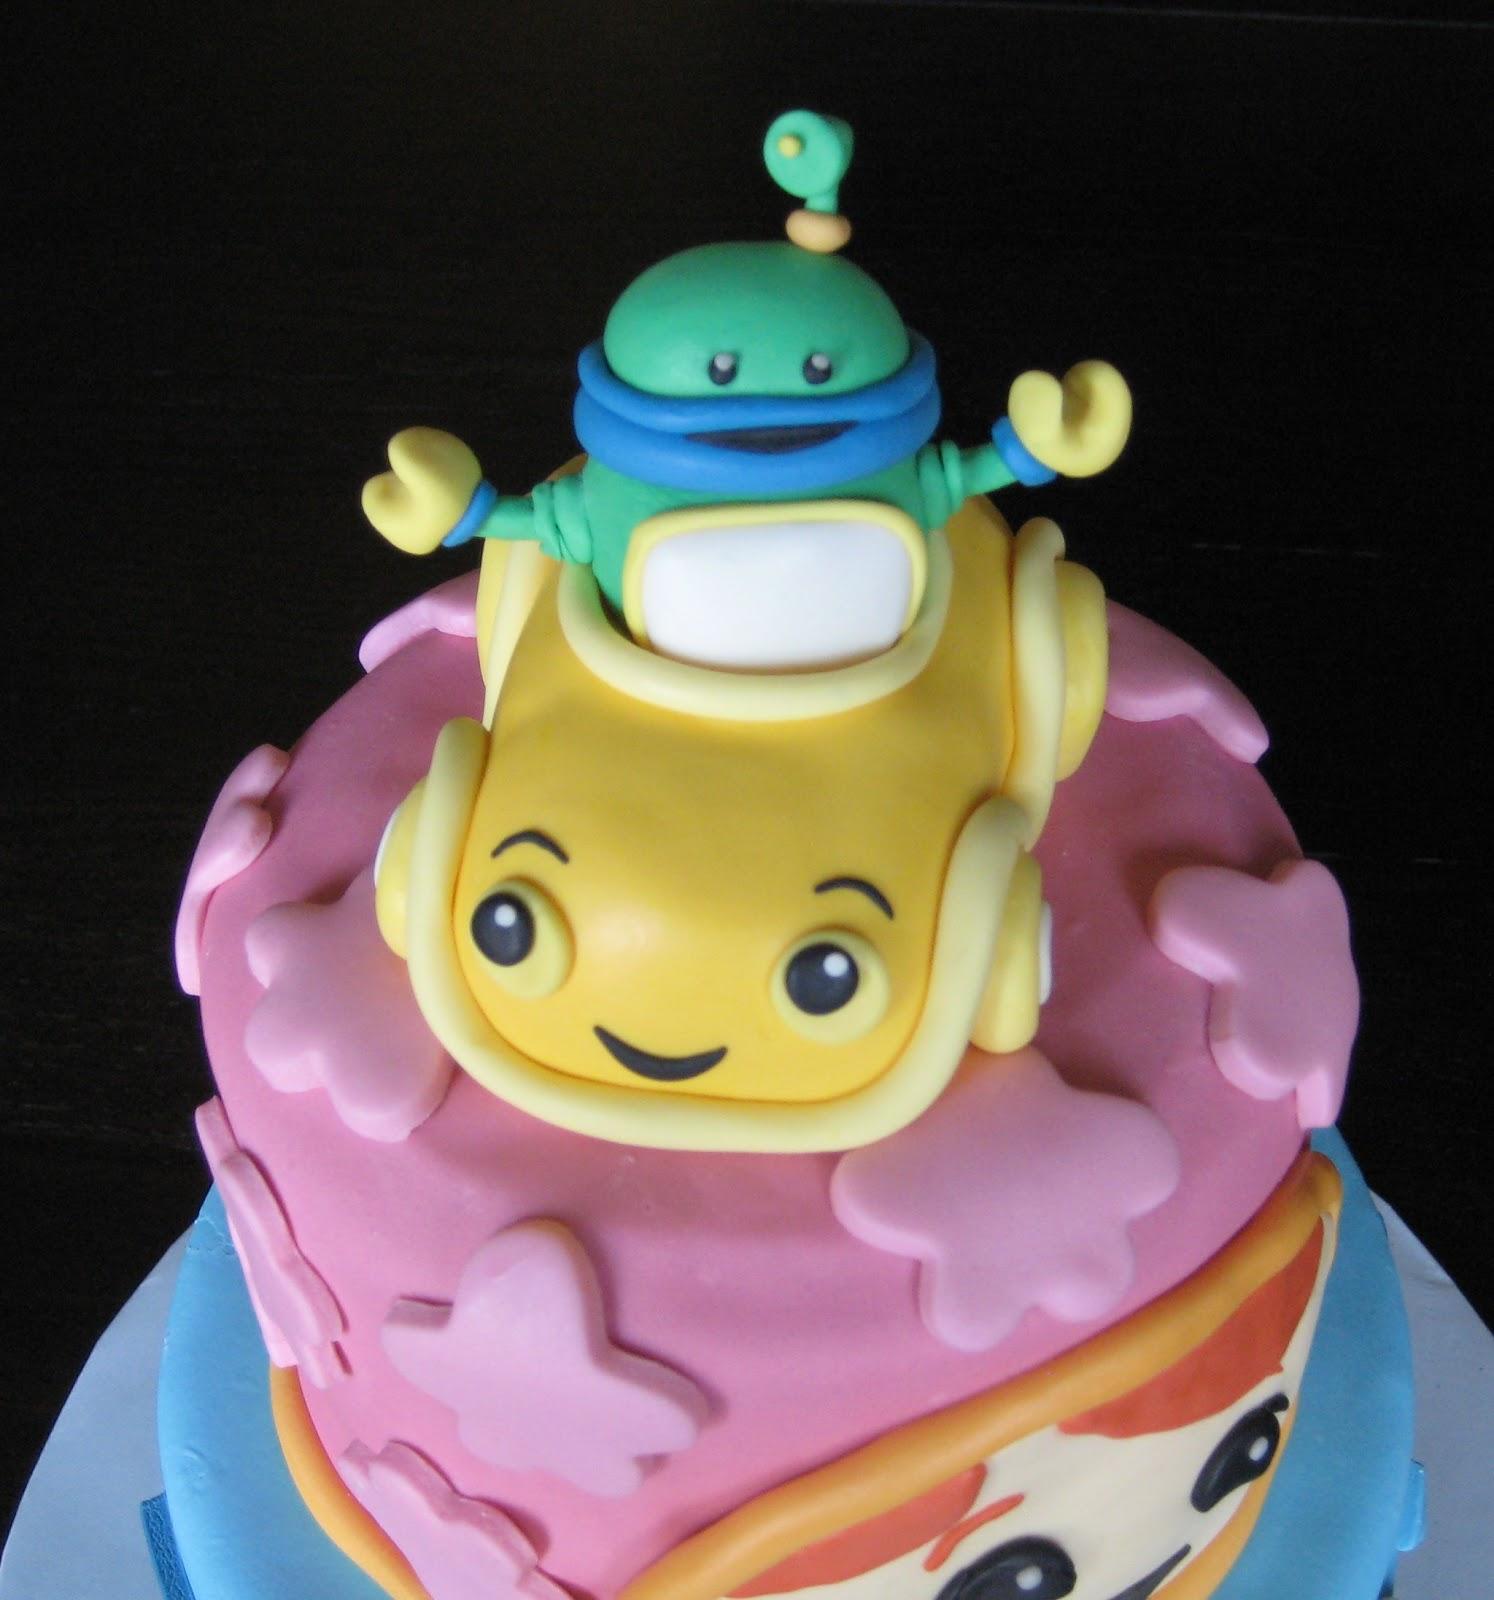 Bot  amp  Umi-car made of cereal treats  amp  gum pasteTeam Umizoomi Cake